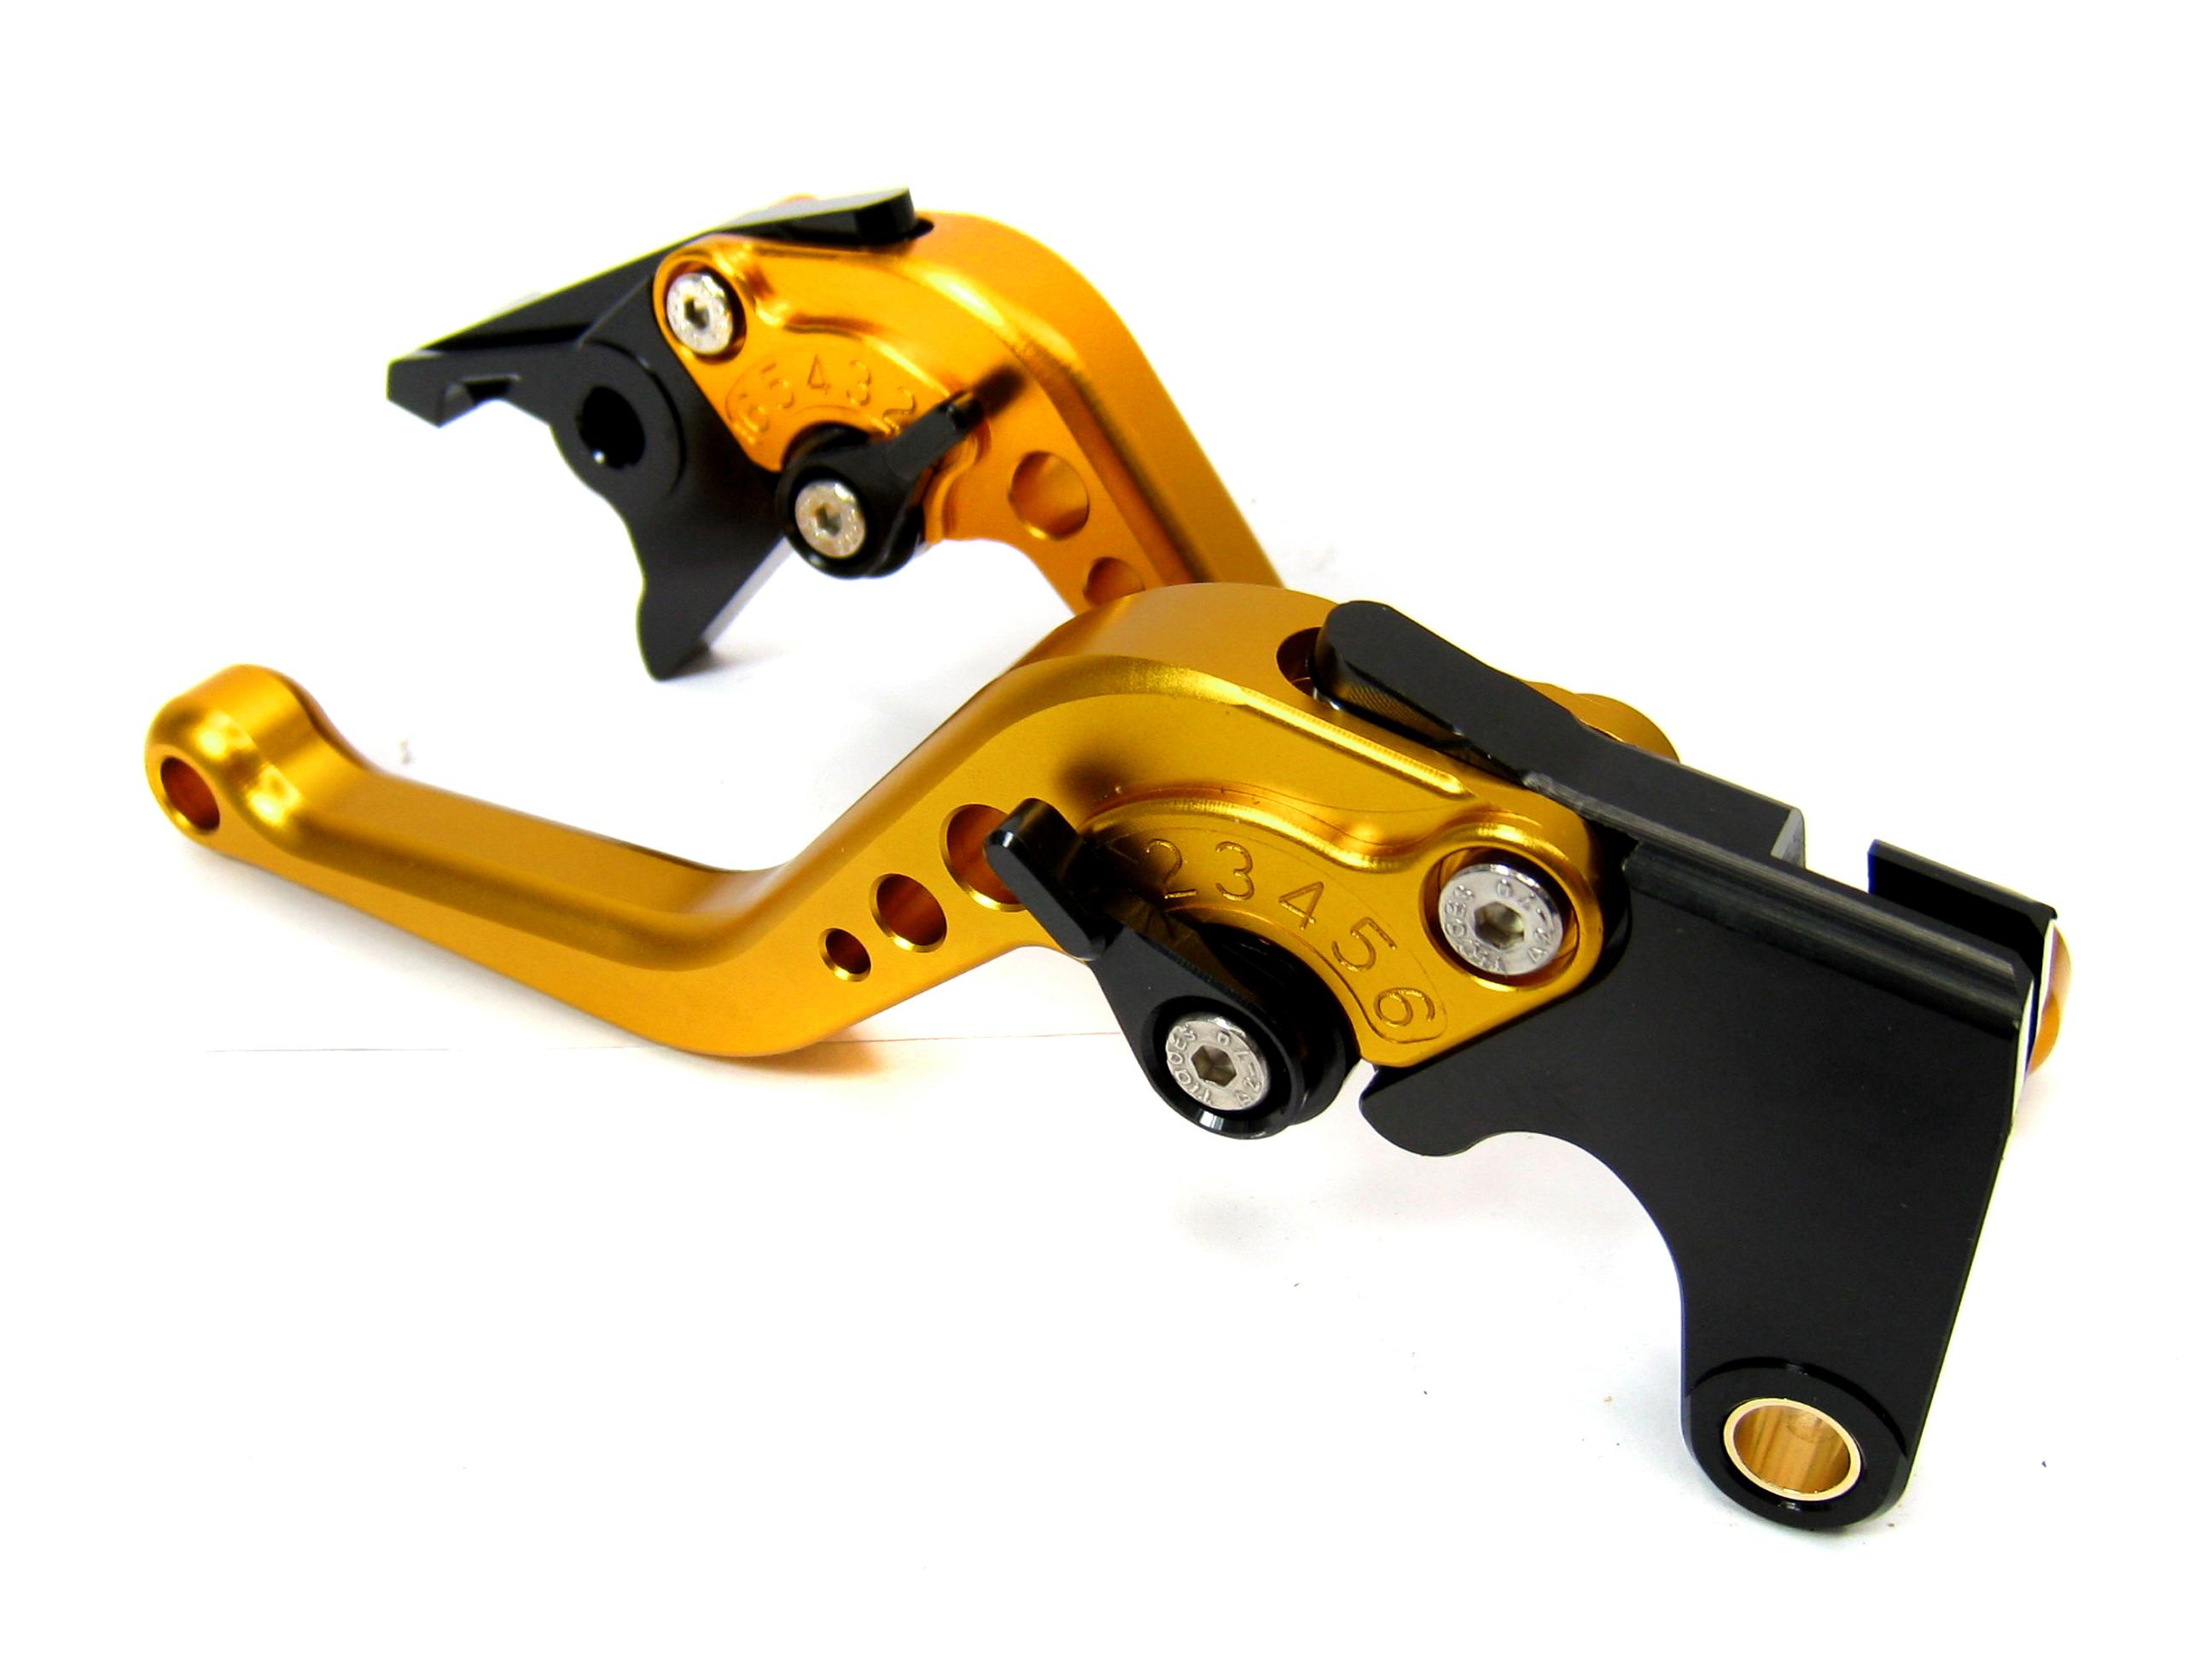 2pcs-Short-Yellow-CNC-Brake-Clutch-Levers-for-Suzuki-GSXR1000-2009-14-10-11-SYB